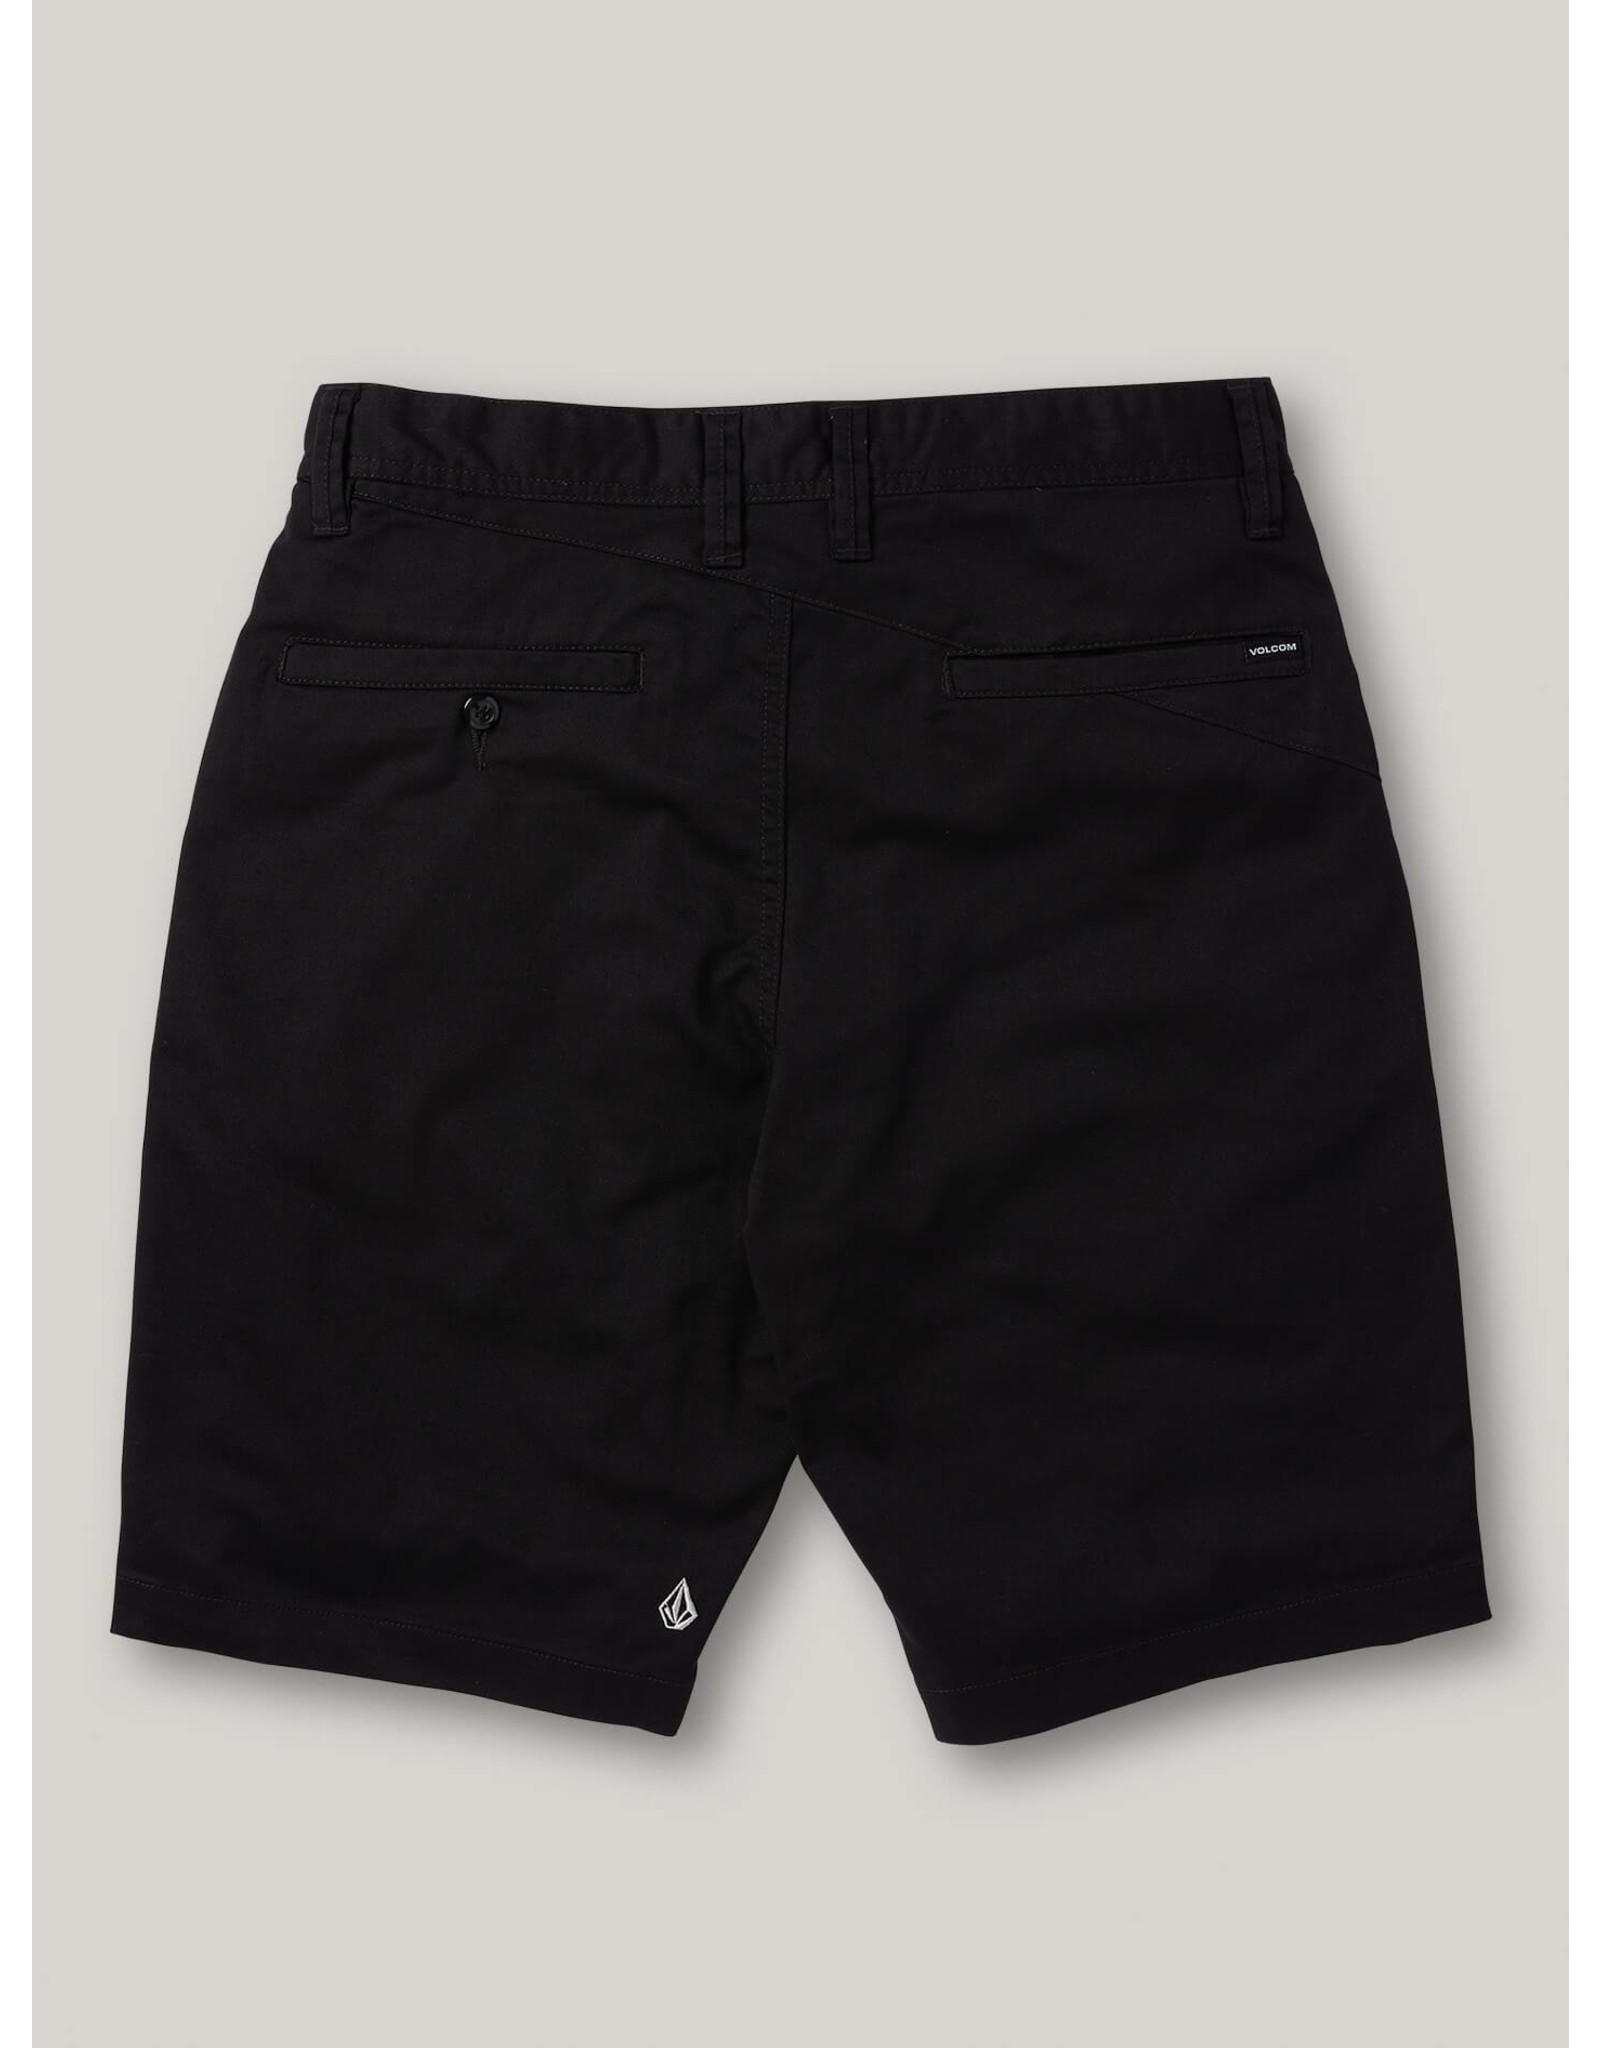 Volcom Frickin Modern Stretch Short - Black